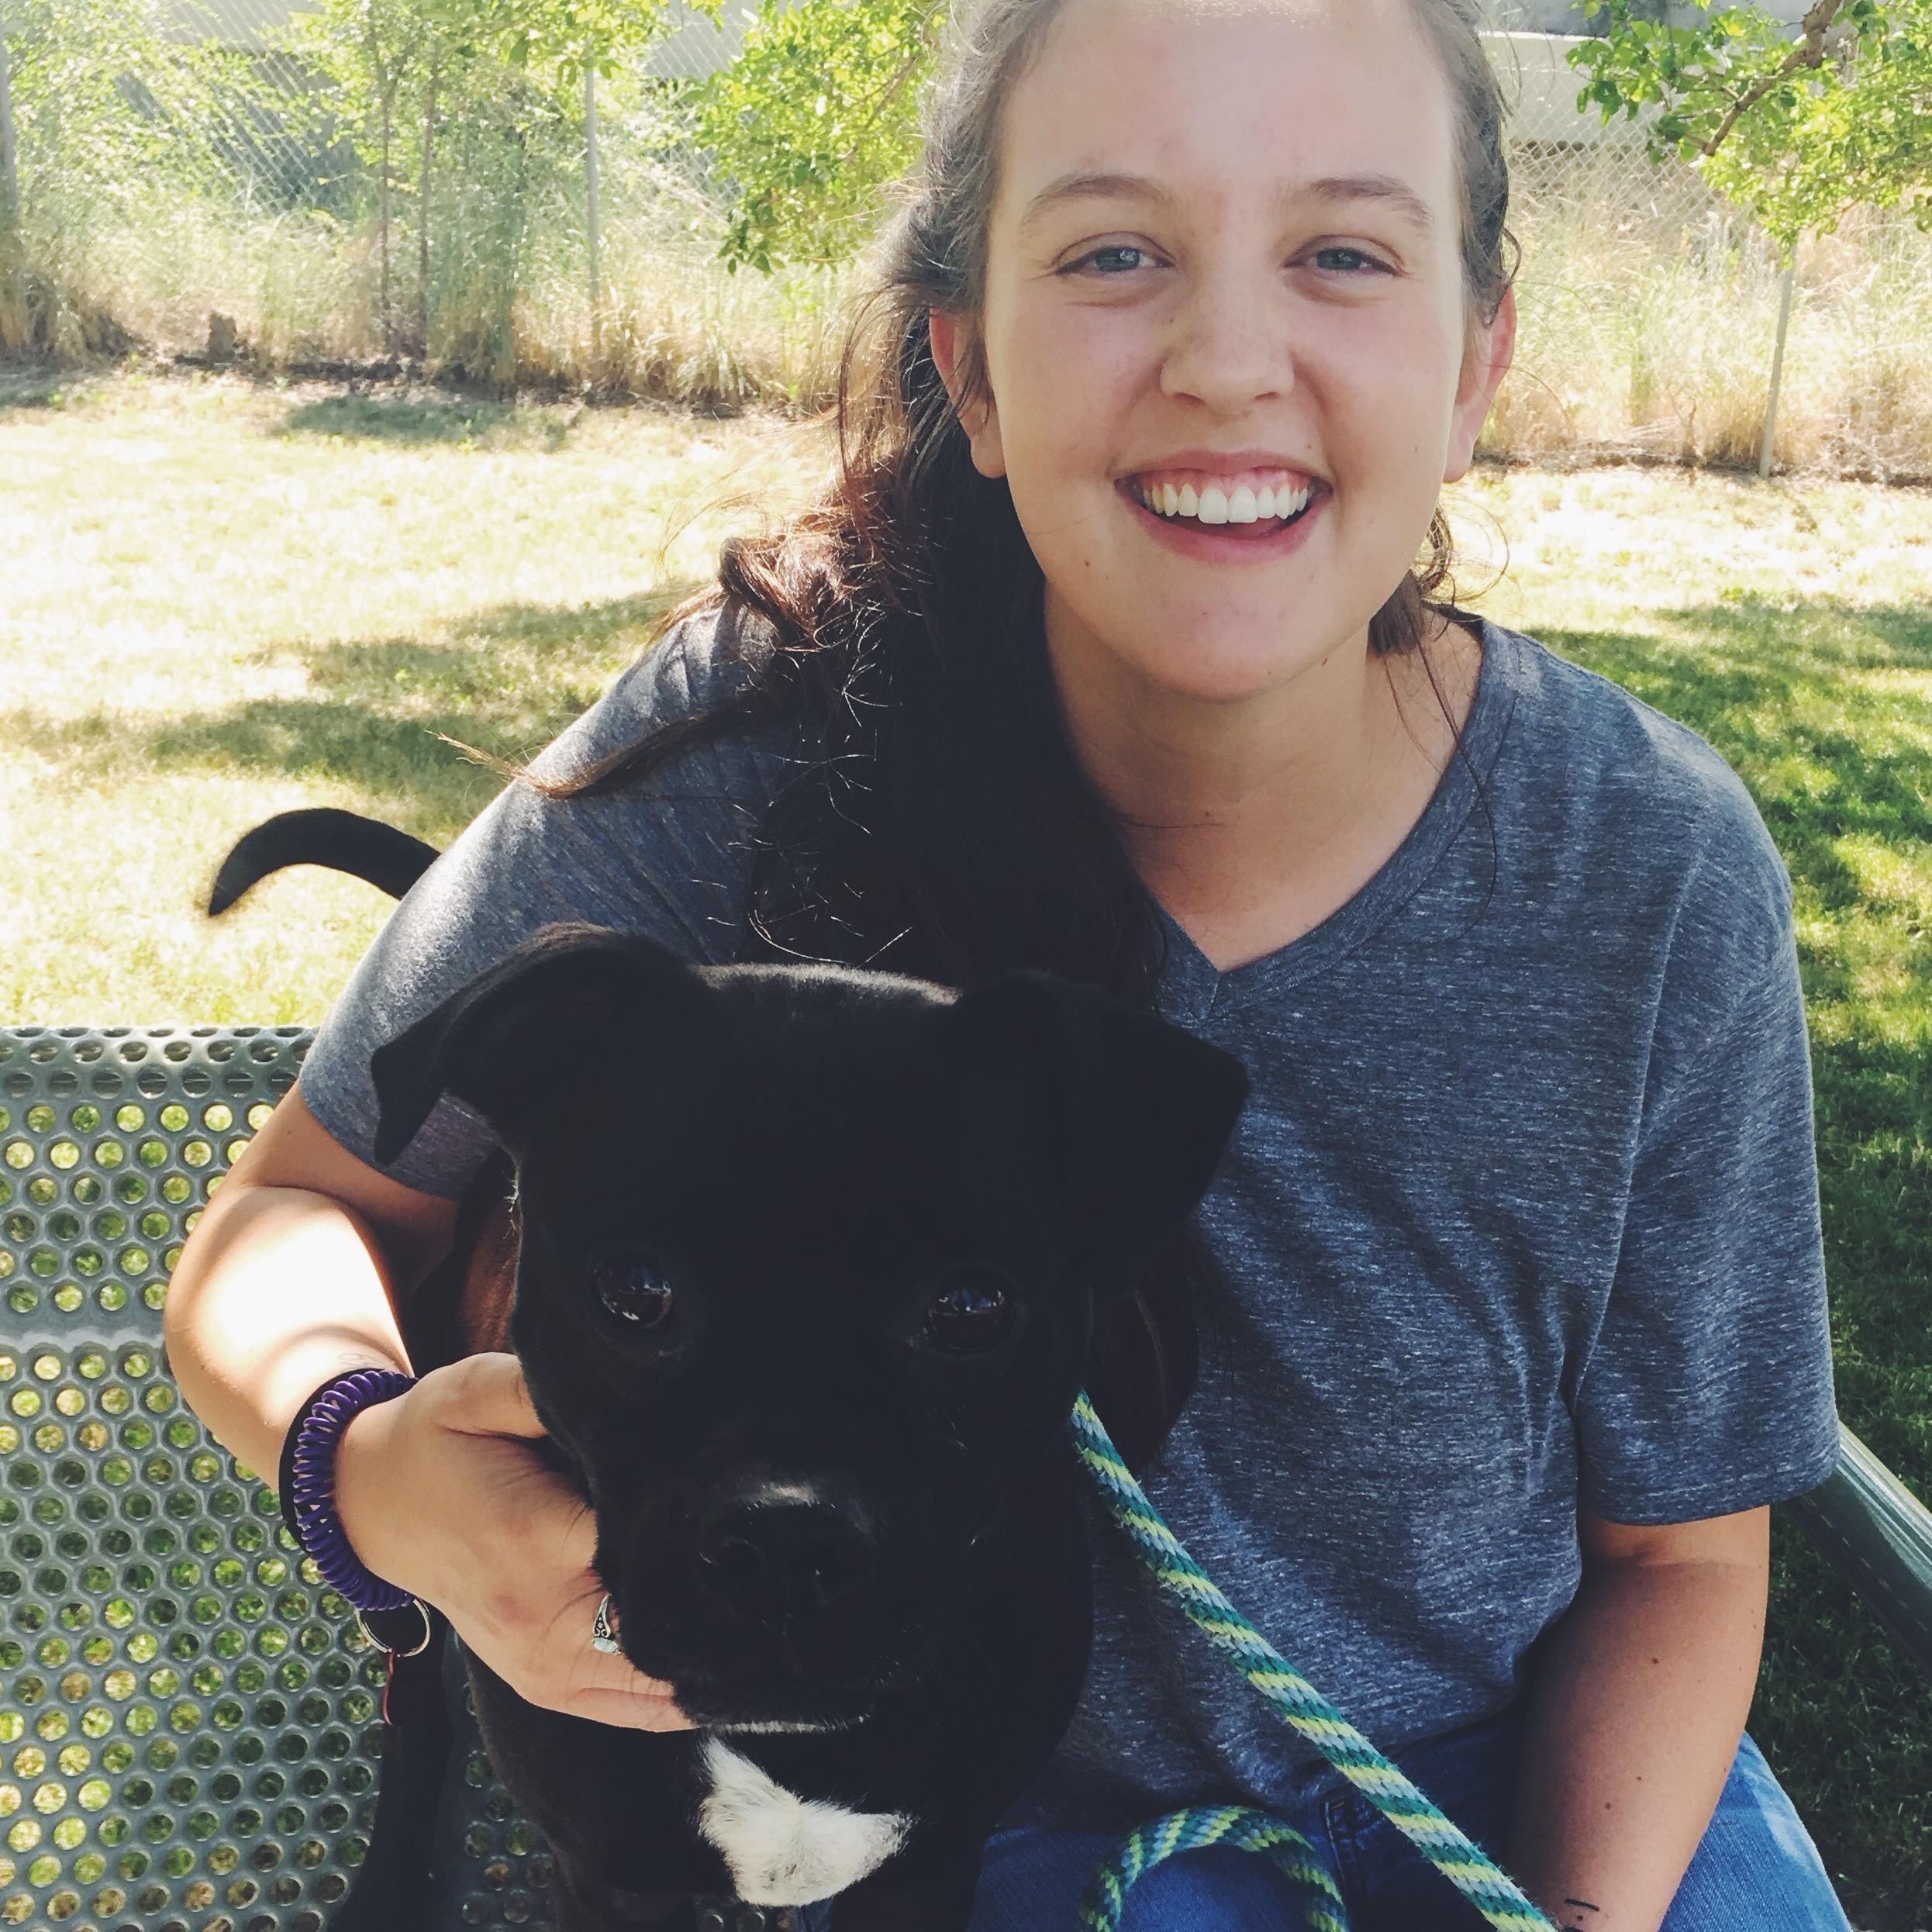 Katlynn's dog day care